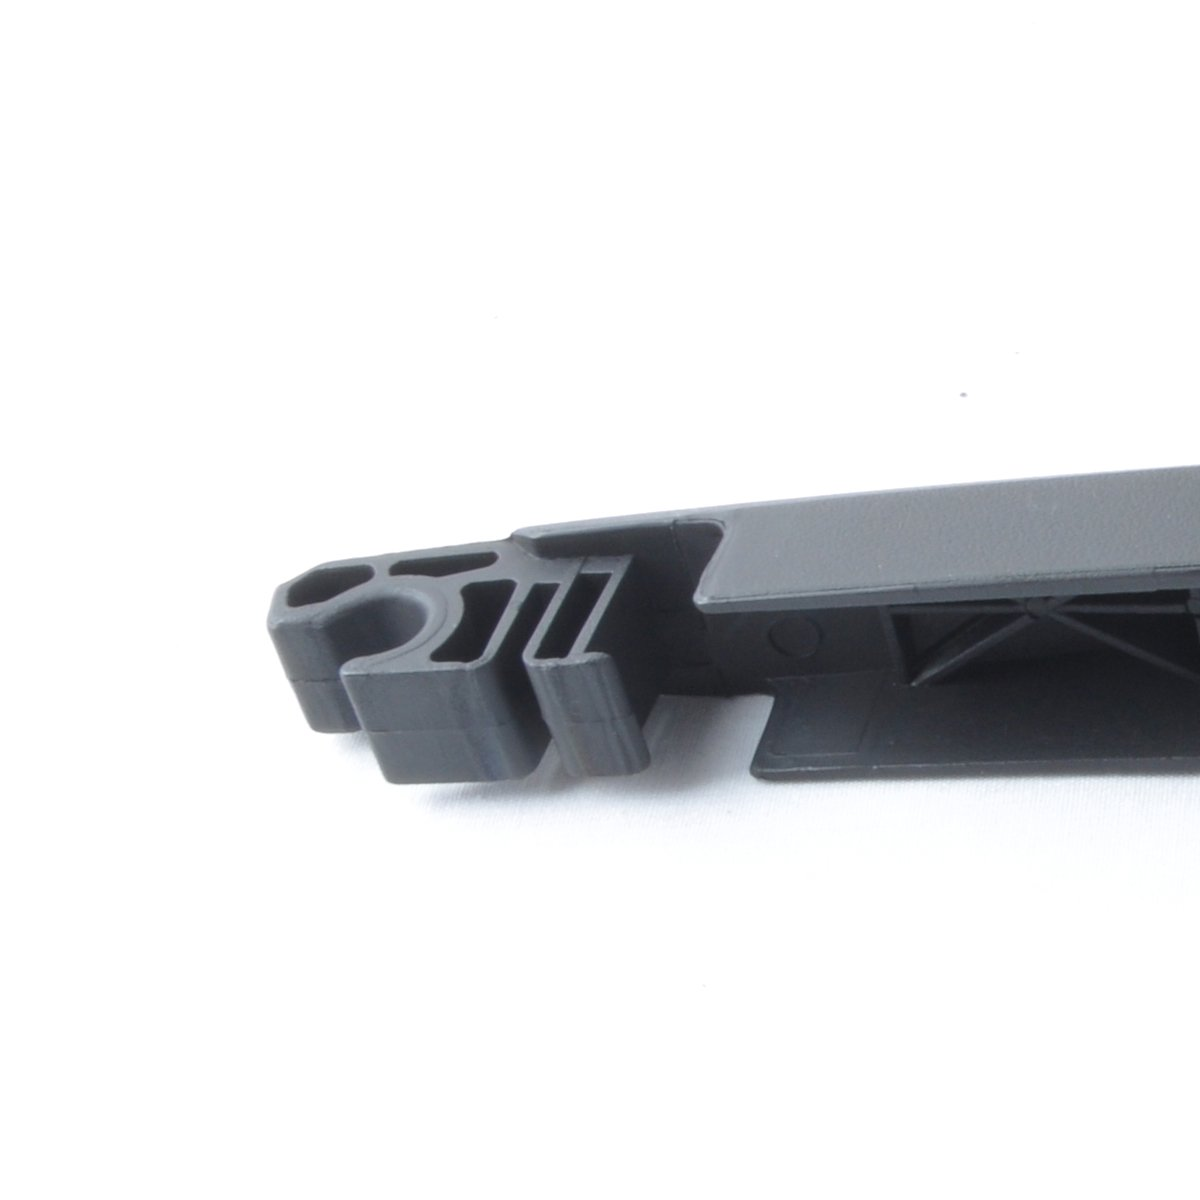 988152P000 OTUAYAUTO Rear Wiper Back Arm Blade Set for KIA SORENTO 2011-2015 OE